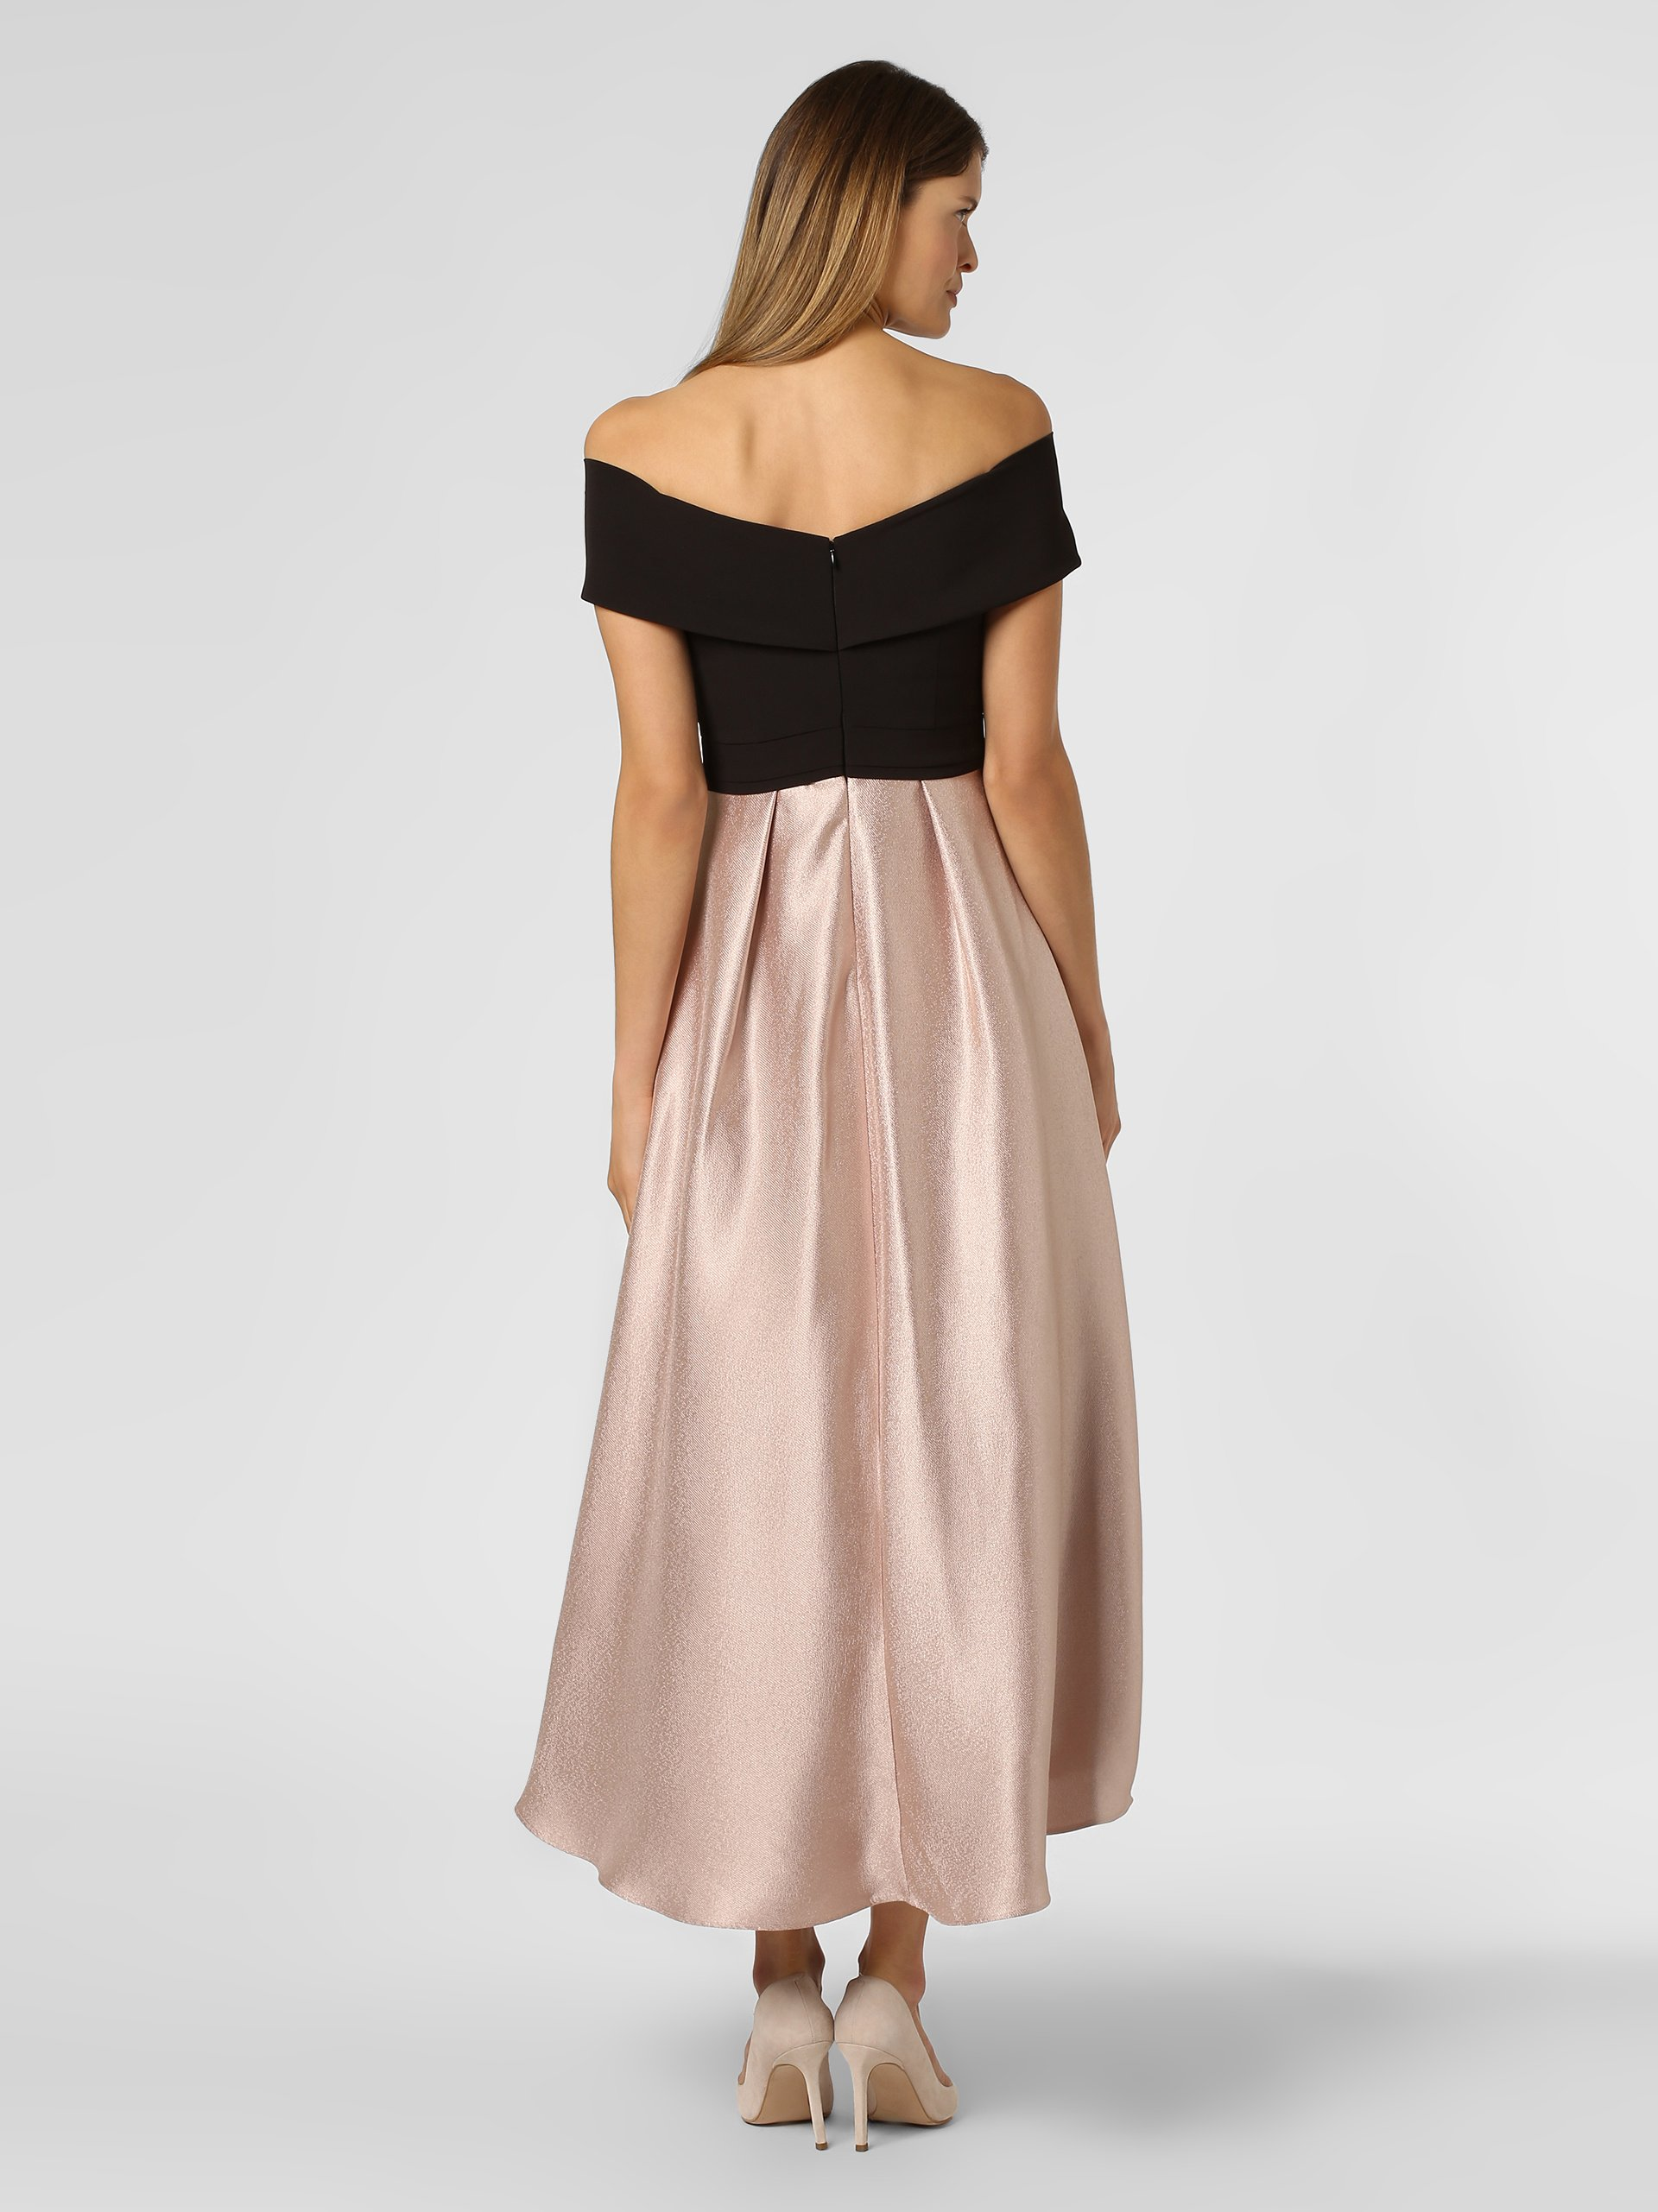 Apriori Damen Abendkleid